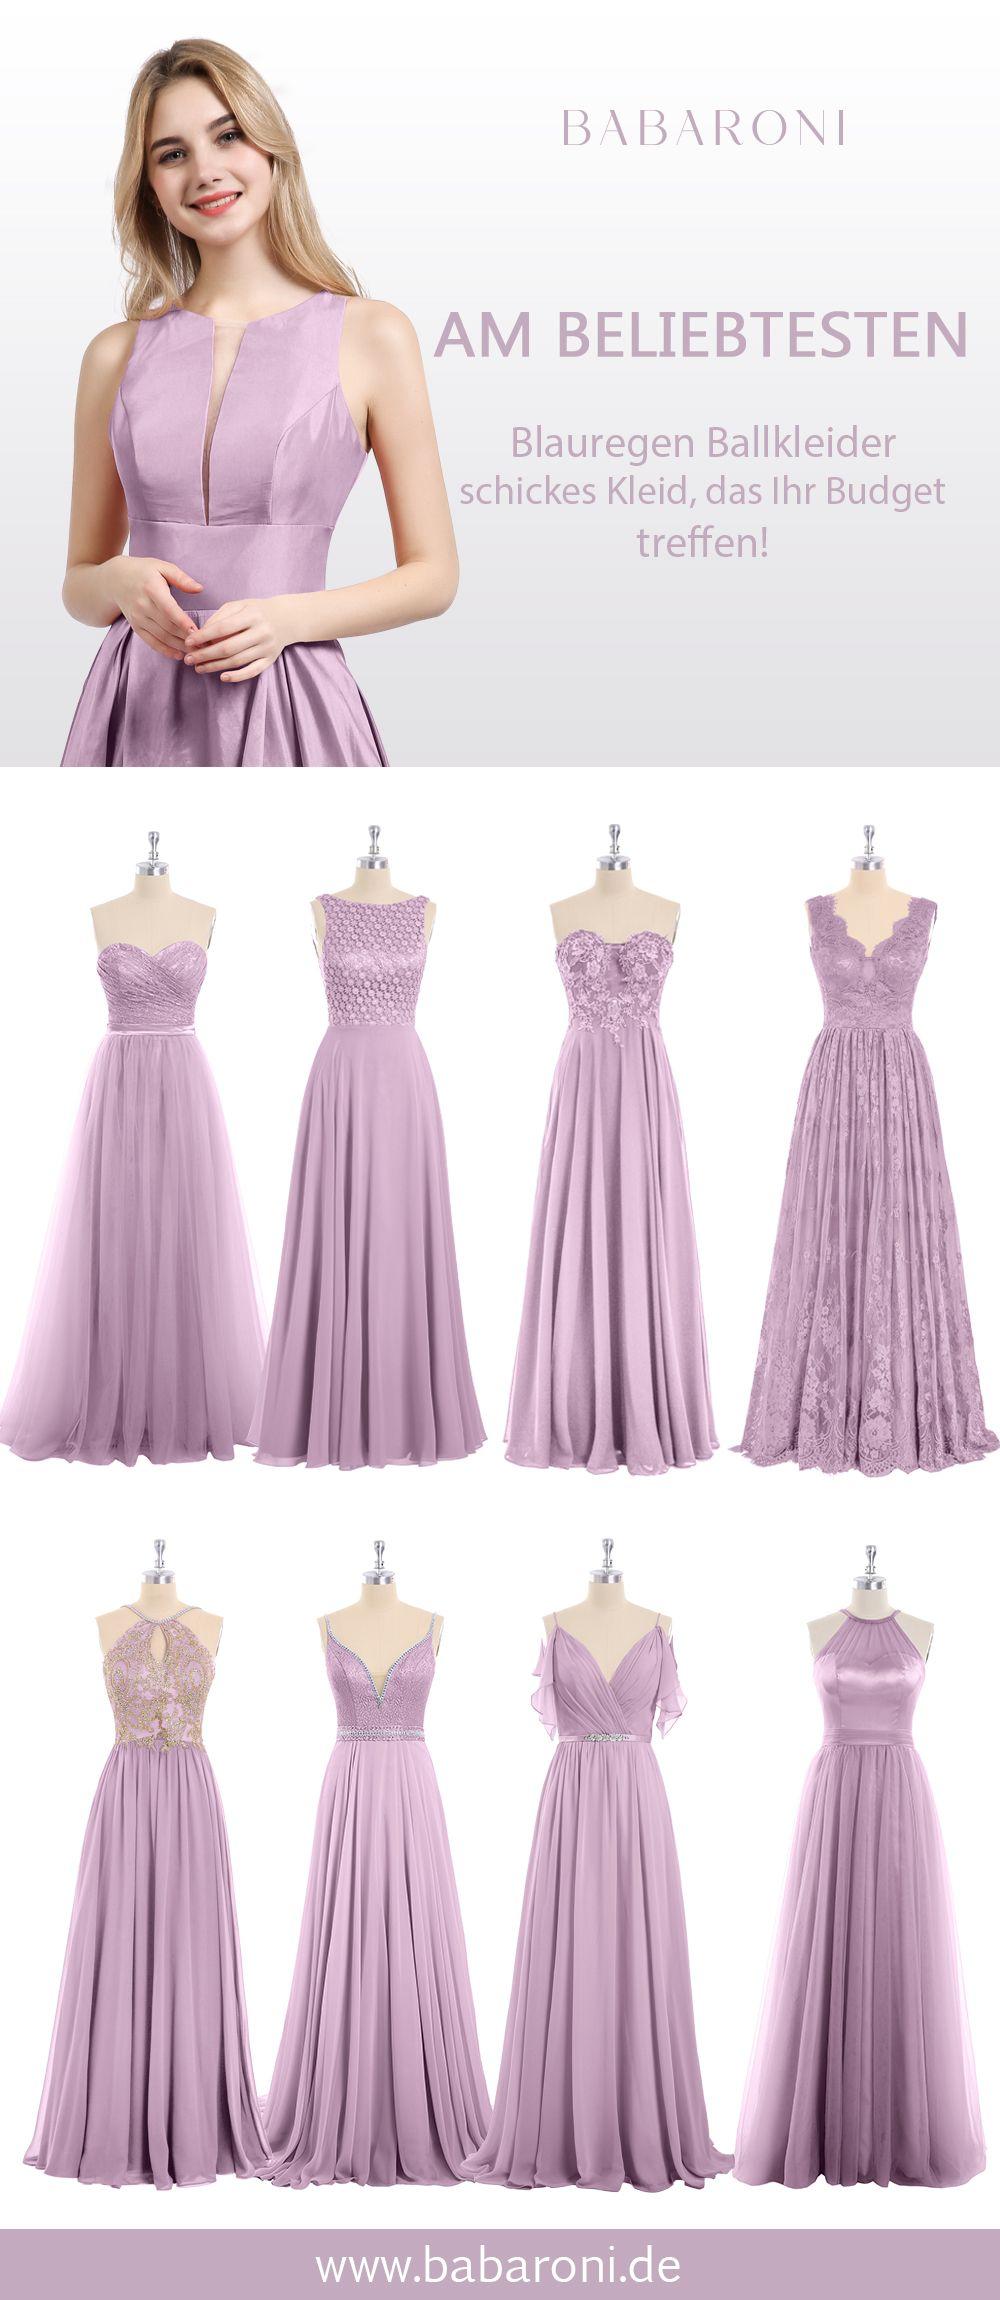 Abendkleider  Lila abendkleid, Abendkleid, Lila kleid